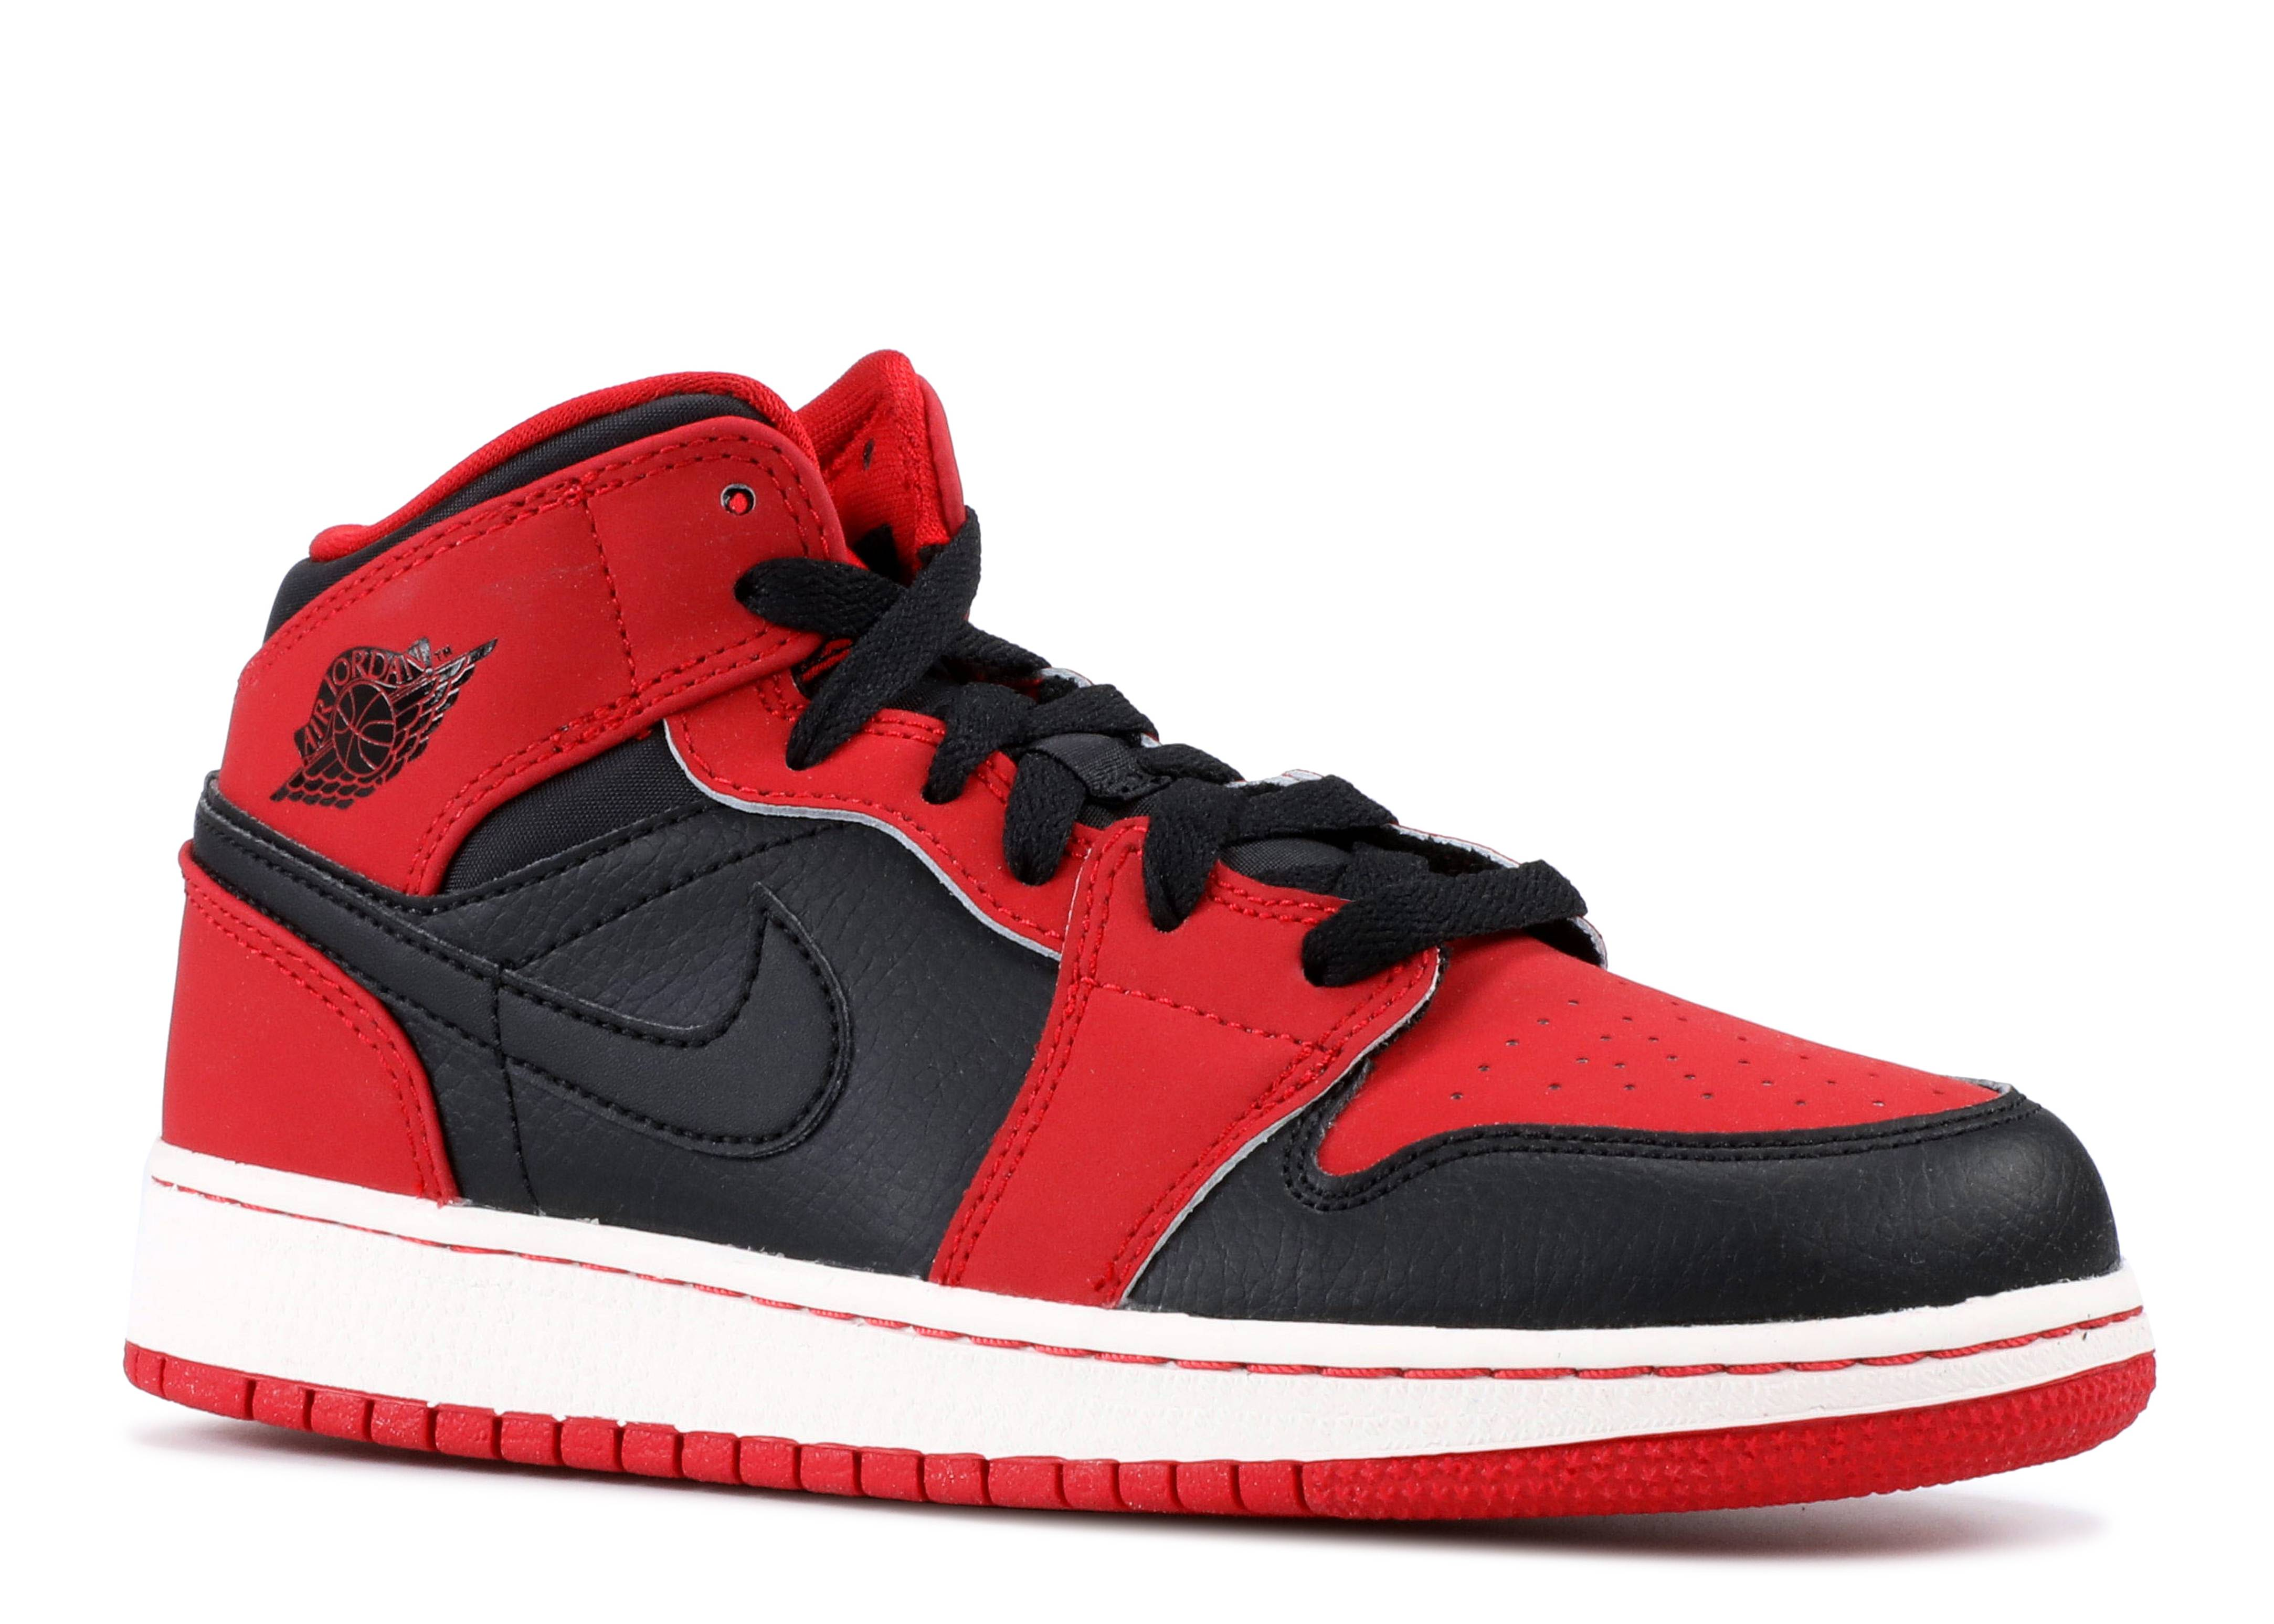 Nike Air Jordan 1 Mid Bg